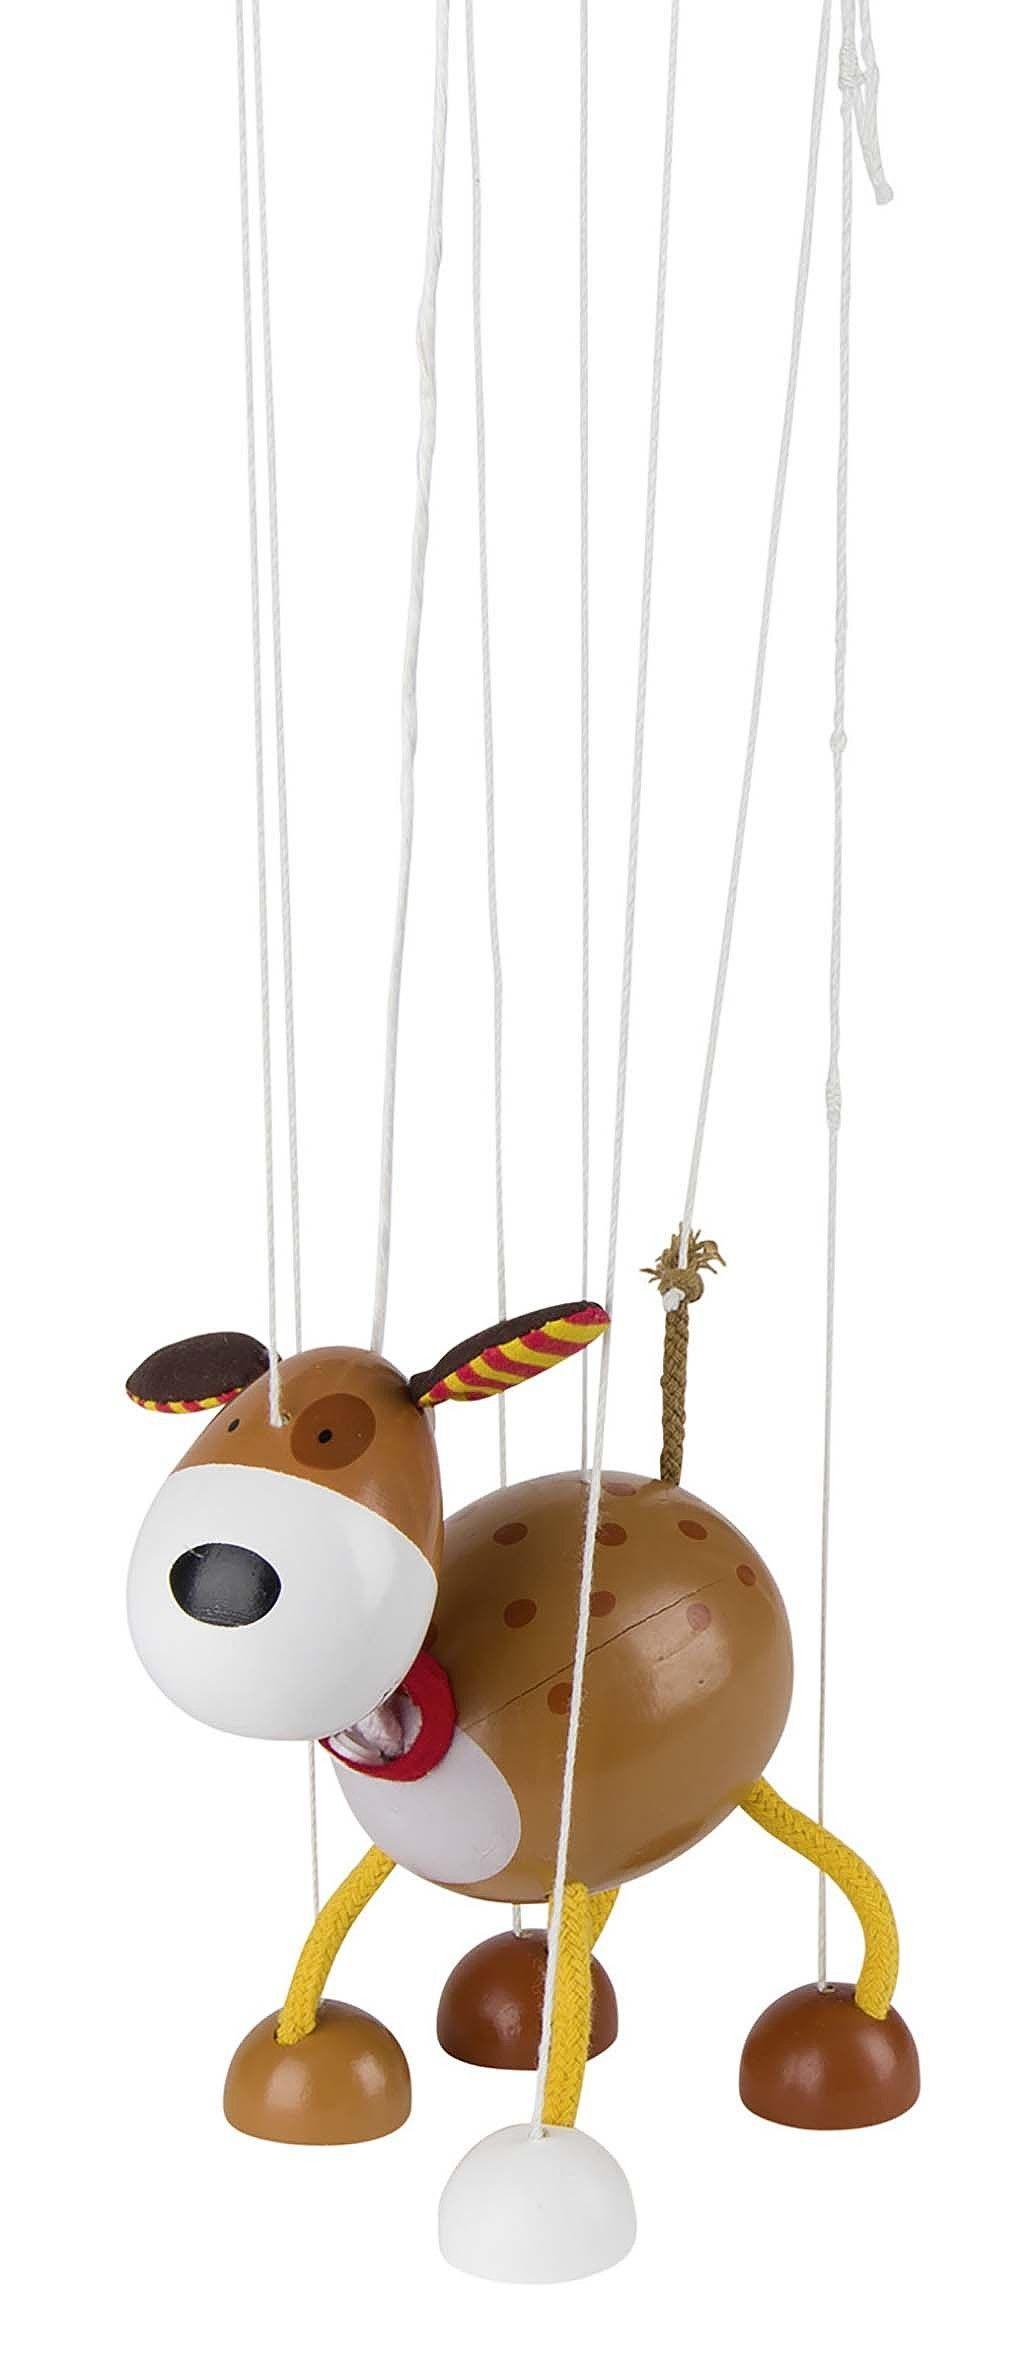 Image of   Marionetdukke fra Goki - Hund